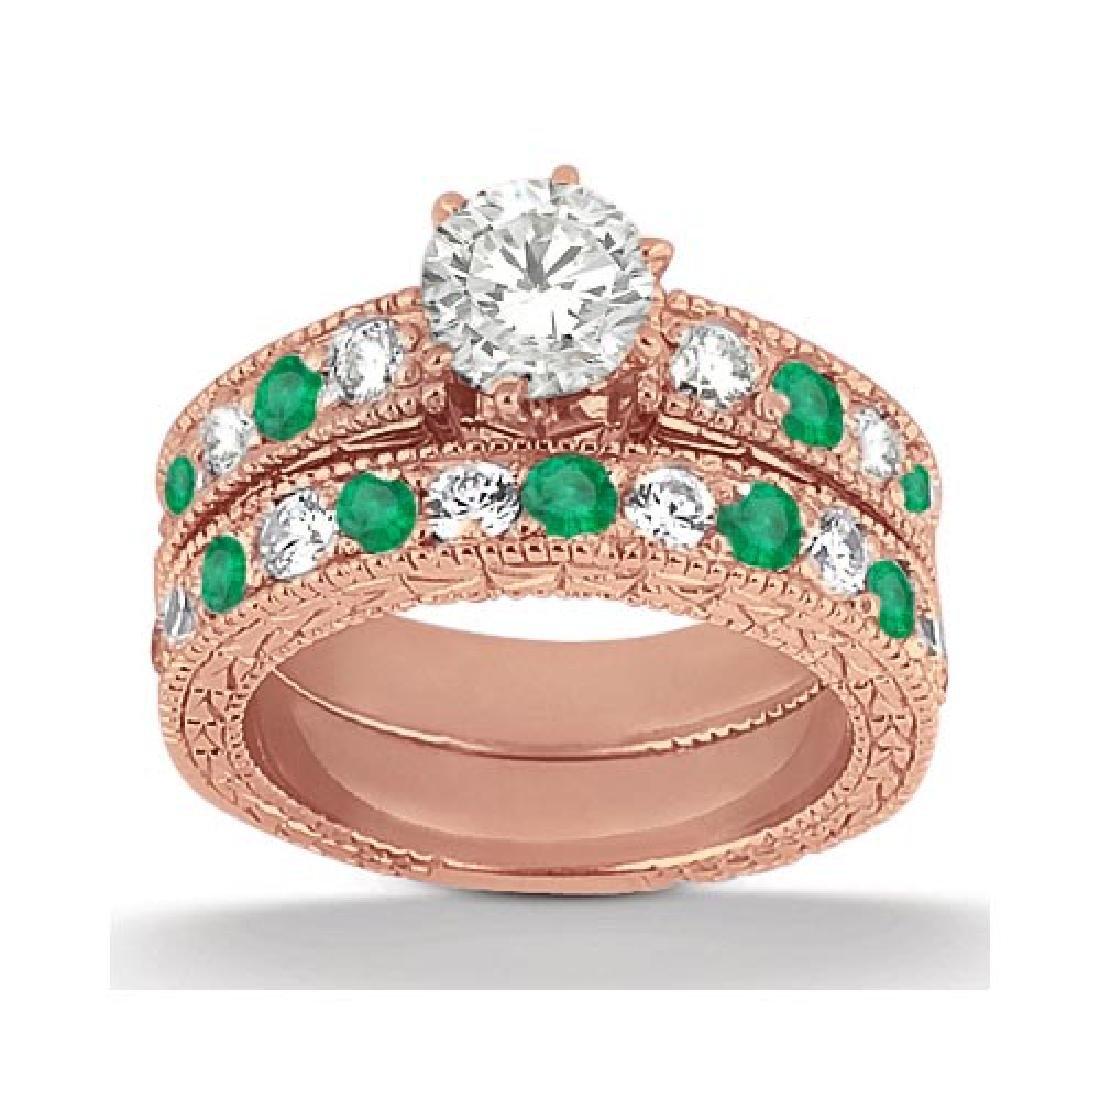 Antique Diamond and Emerald Bridal Set 18k Rose Gold